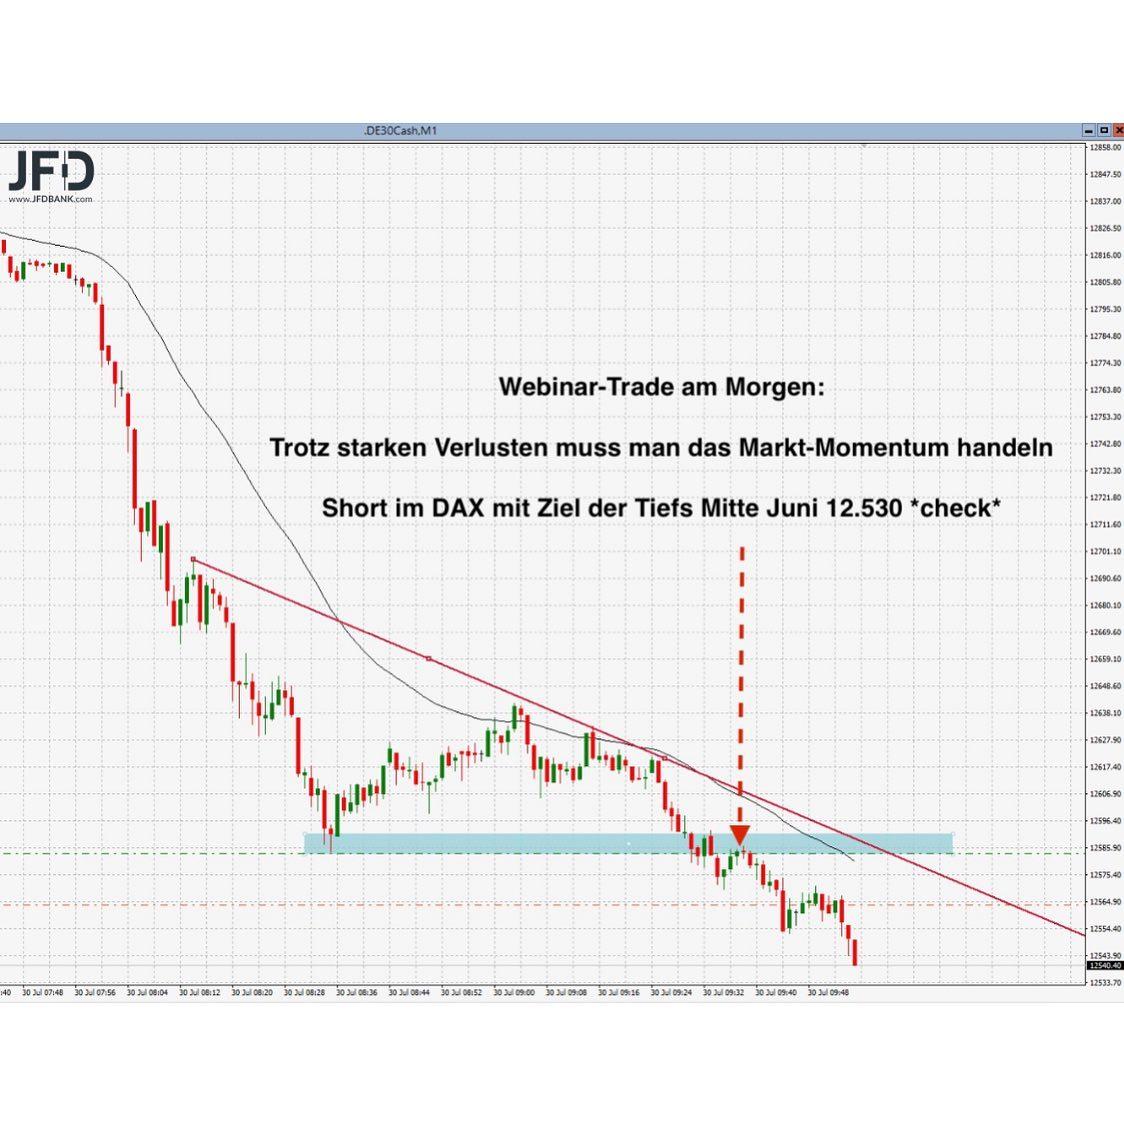 DAX-Trading im Short-Trend